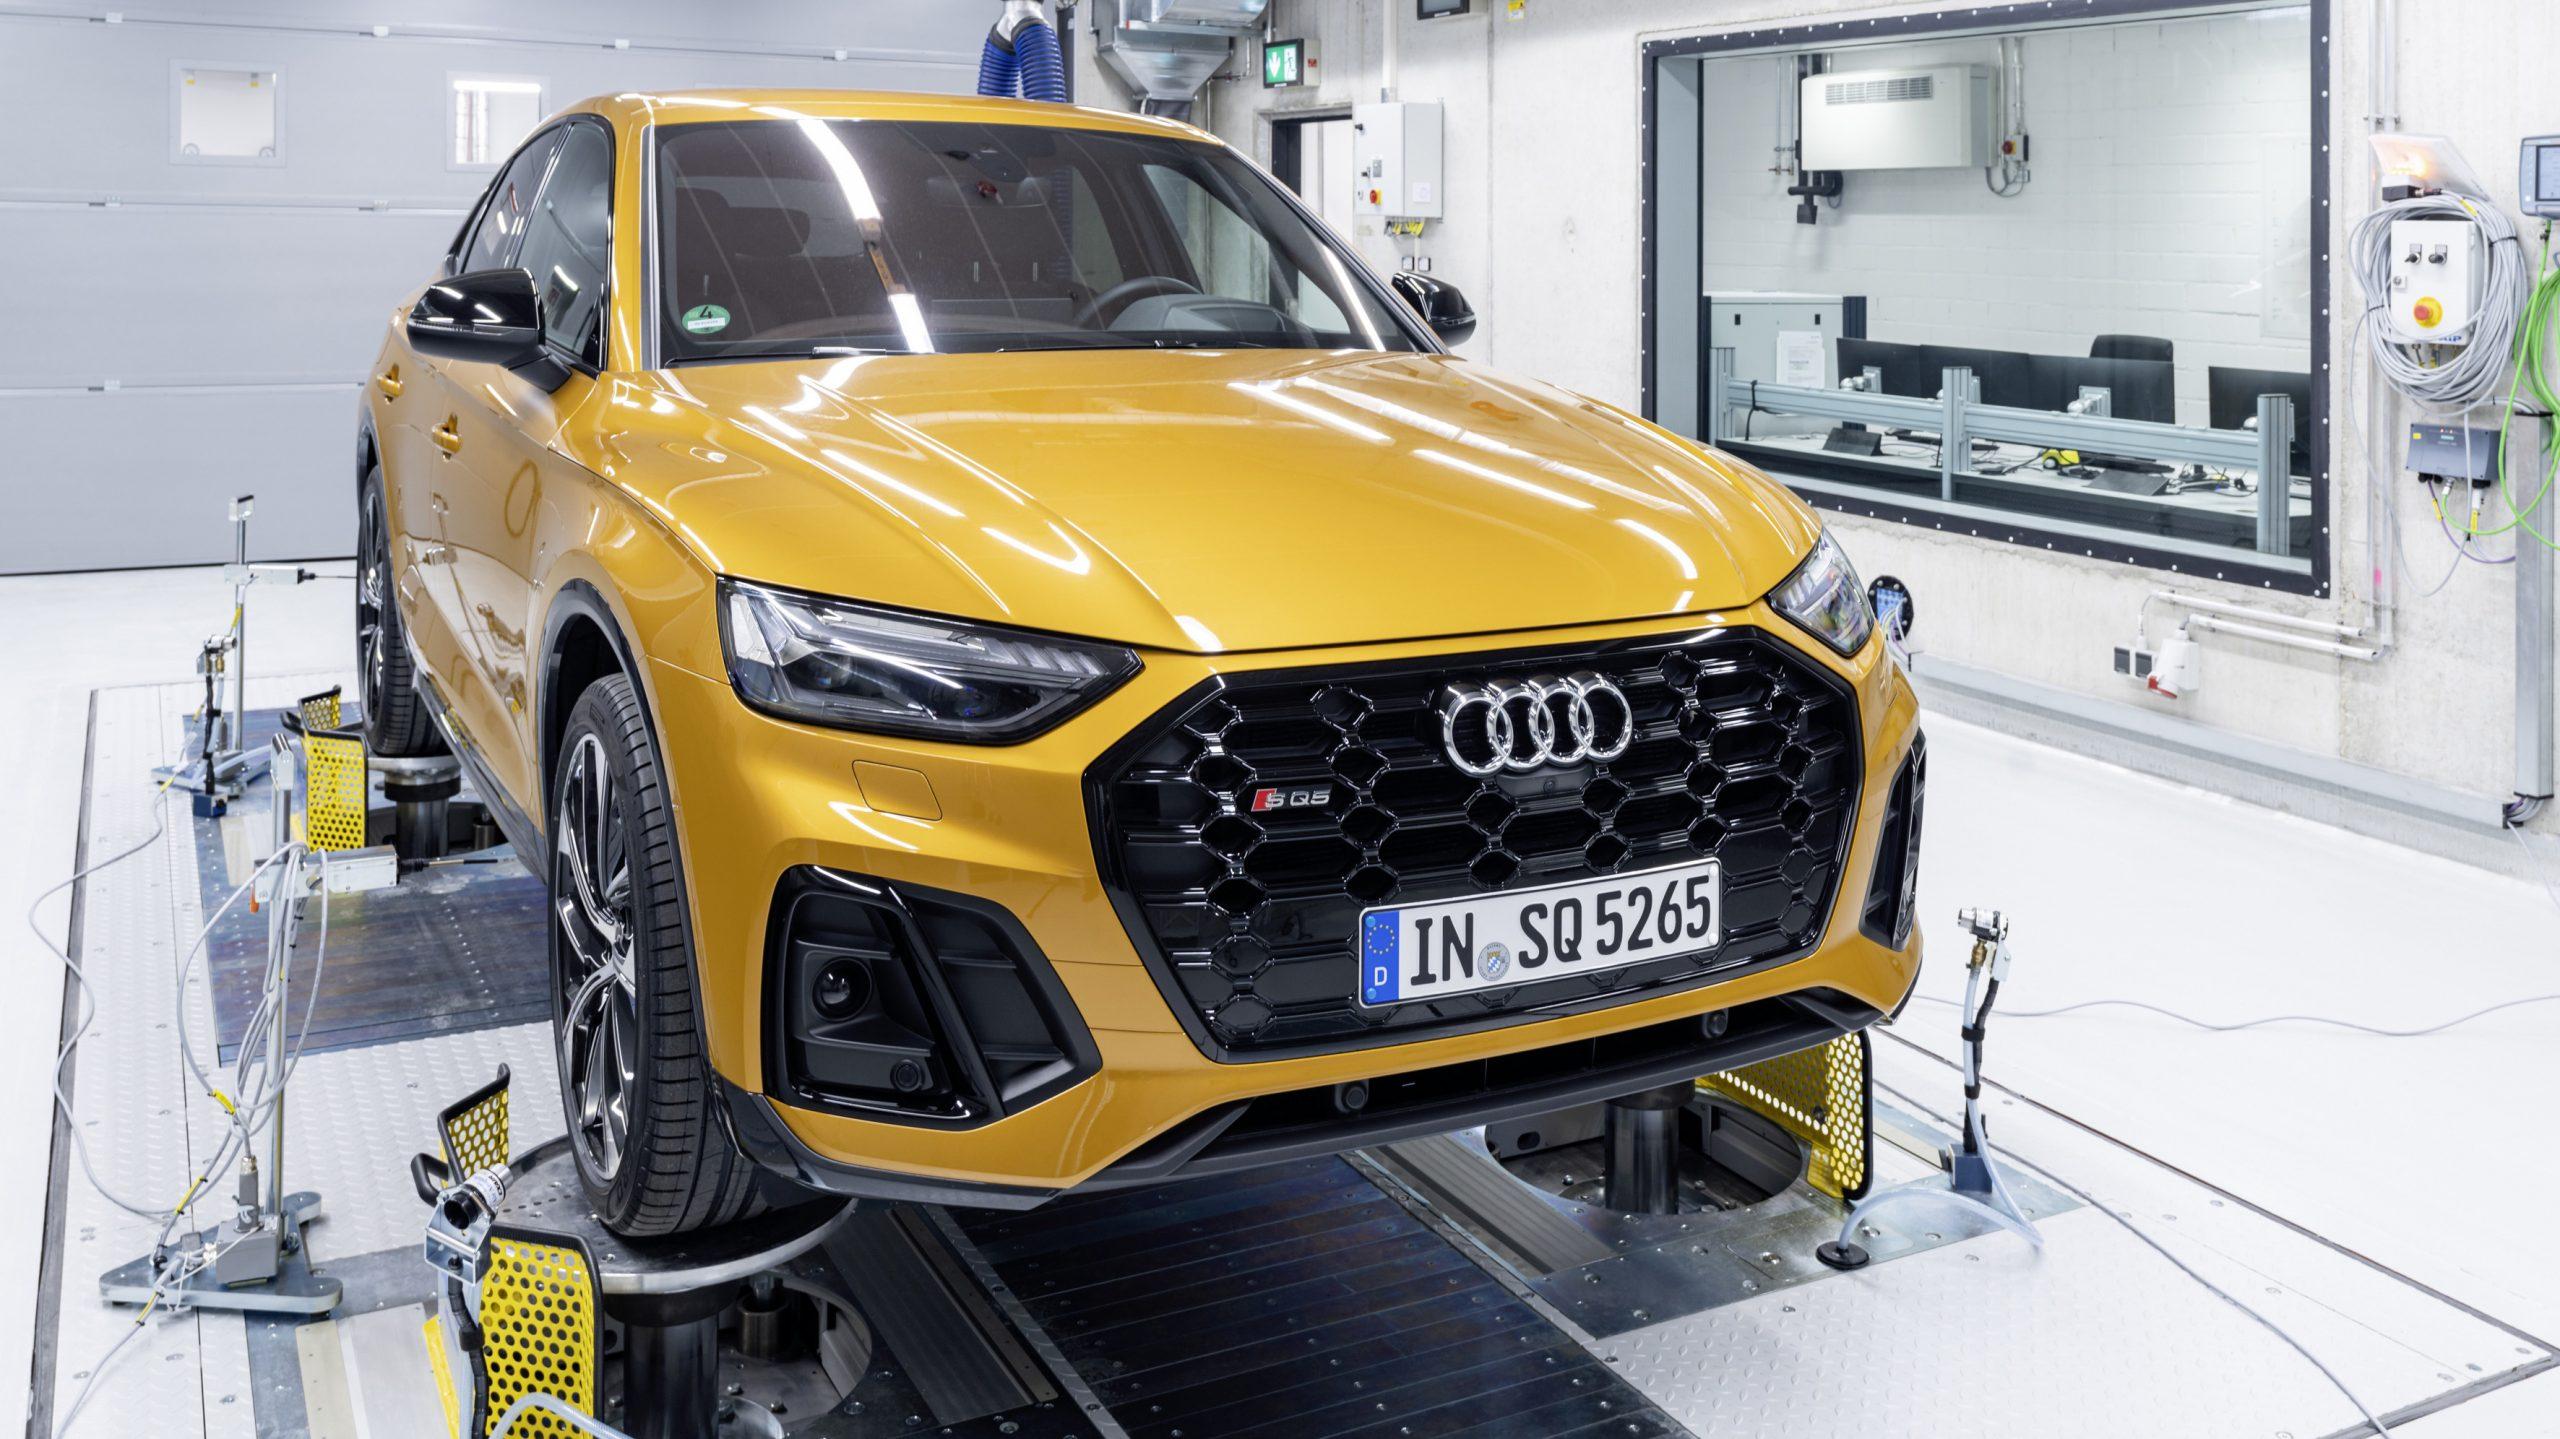 Audi Tik Tok audio and acoustics